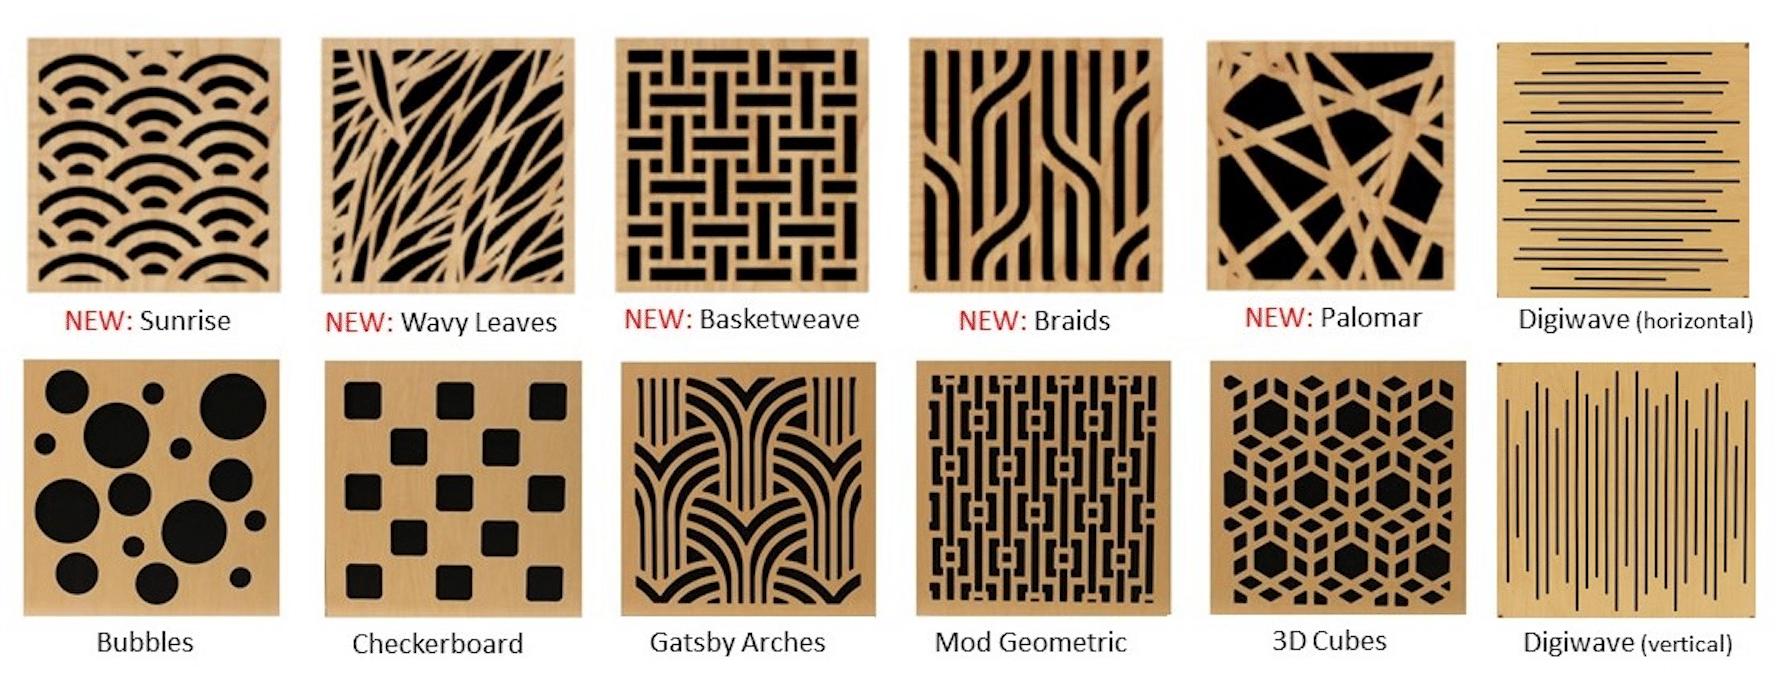 Impression Series Designs By GIK Acoustics